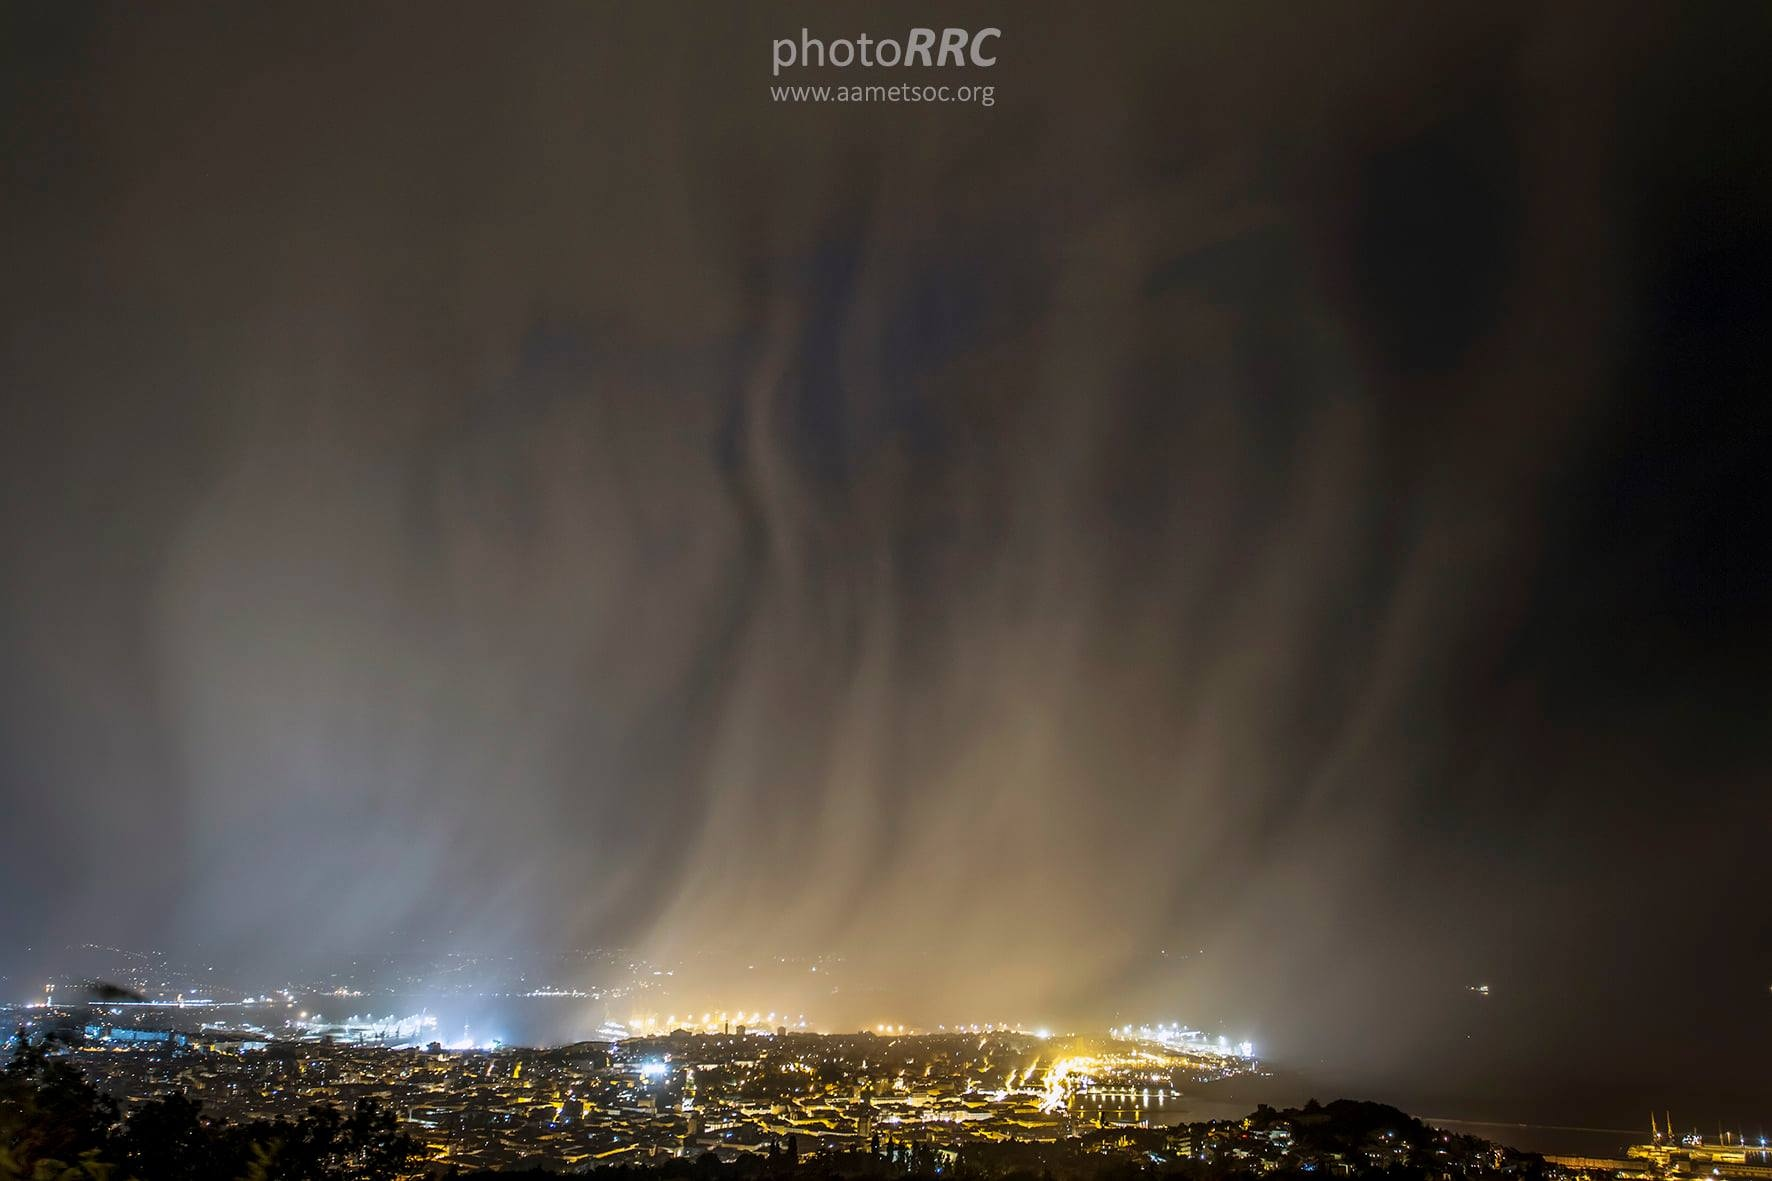 photo-contest-week-28-2021-renato-r-colucci-rain-curtains